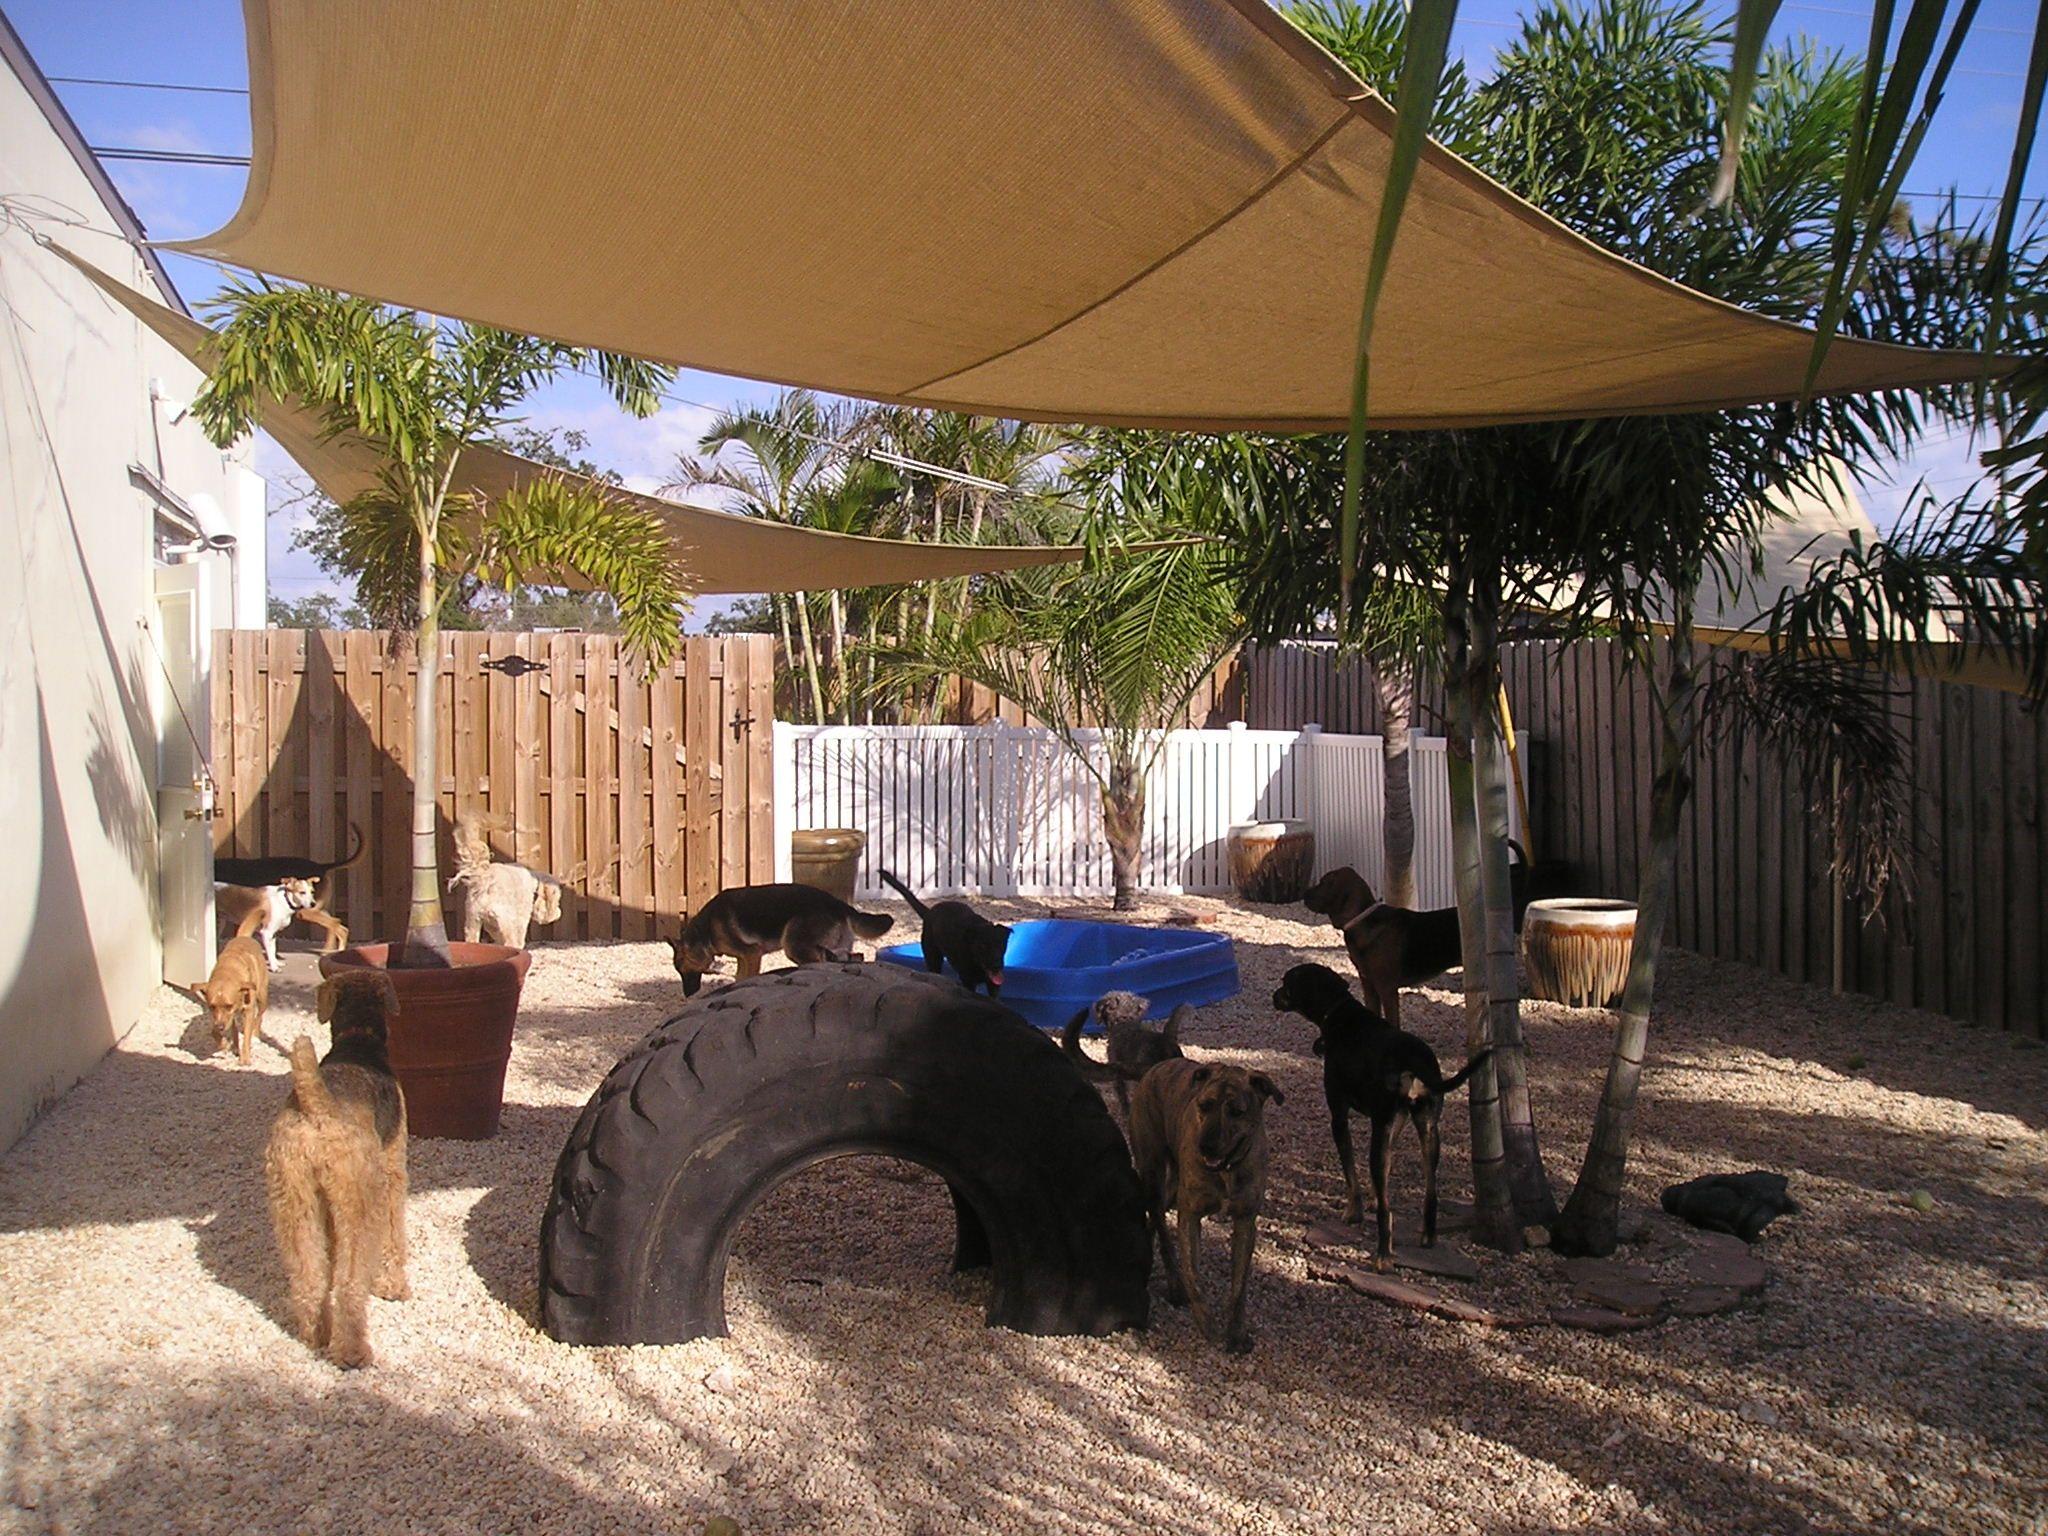 cool play yard set dogs